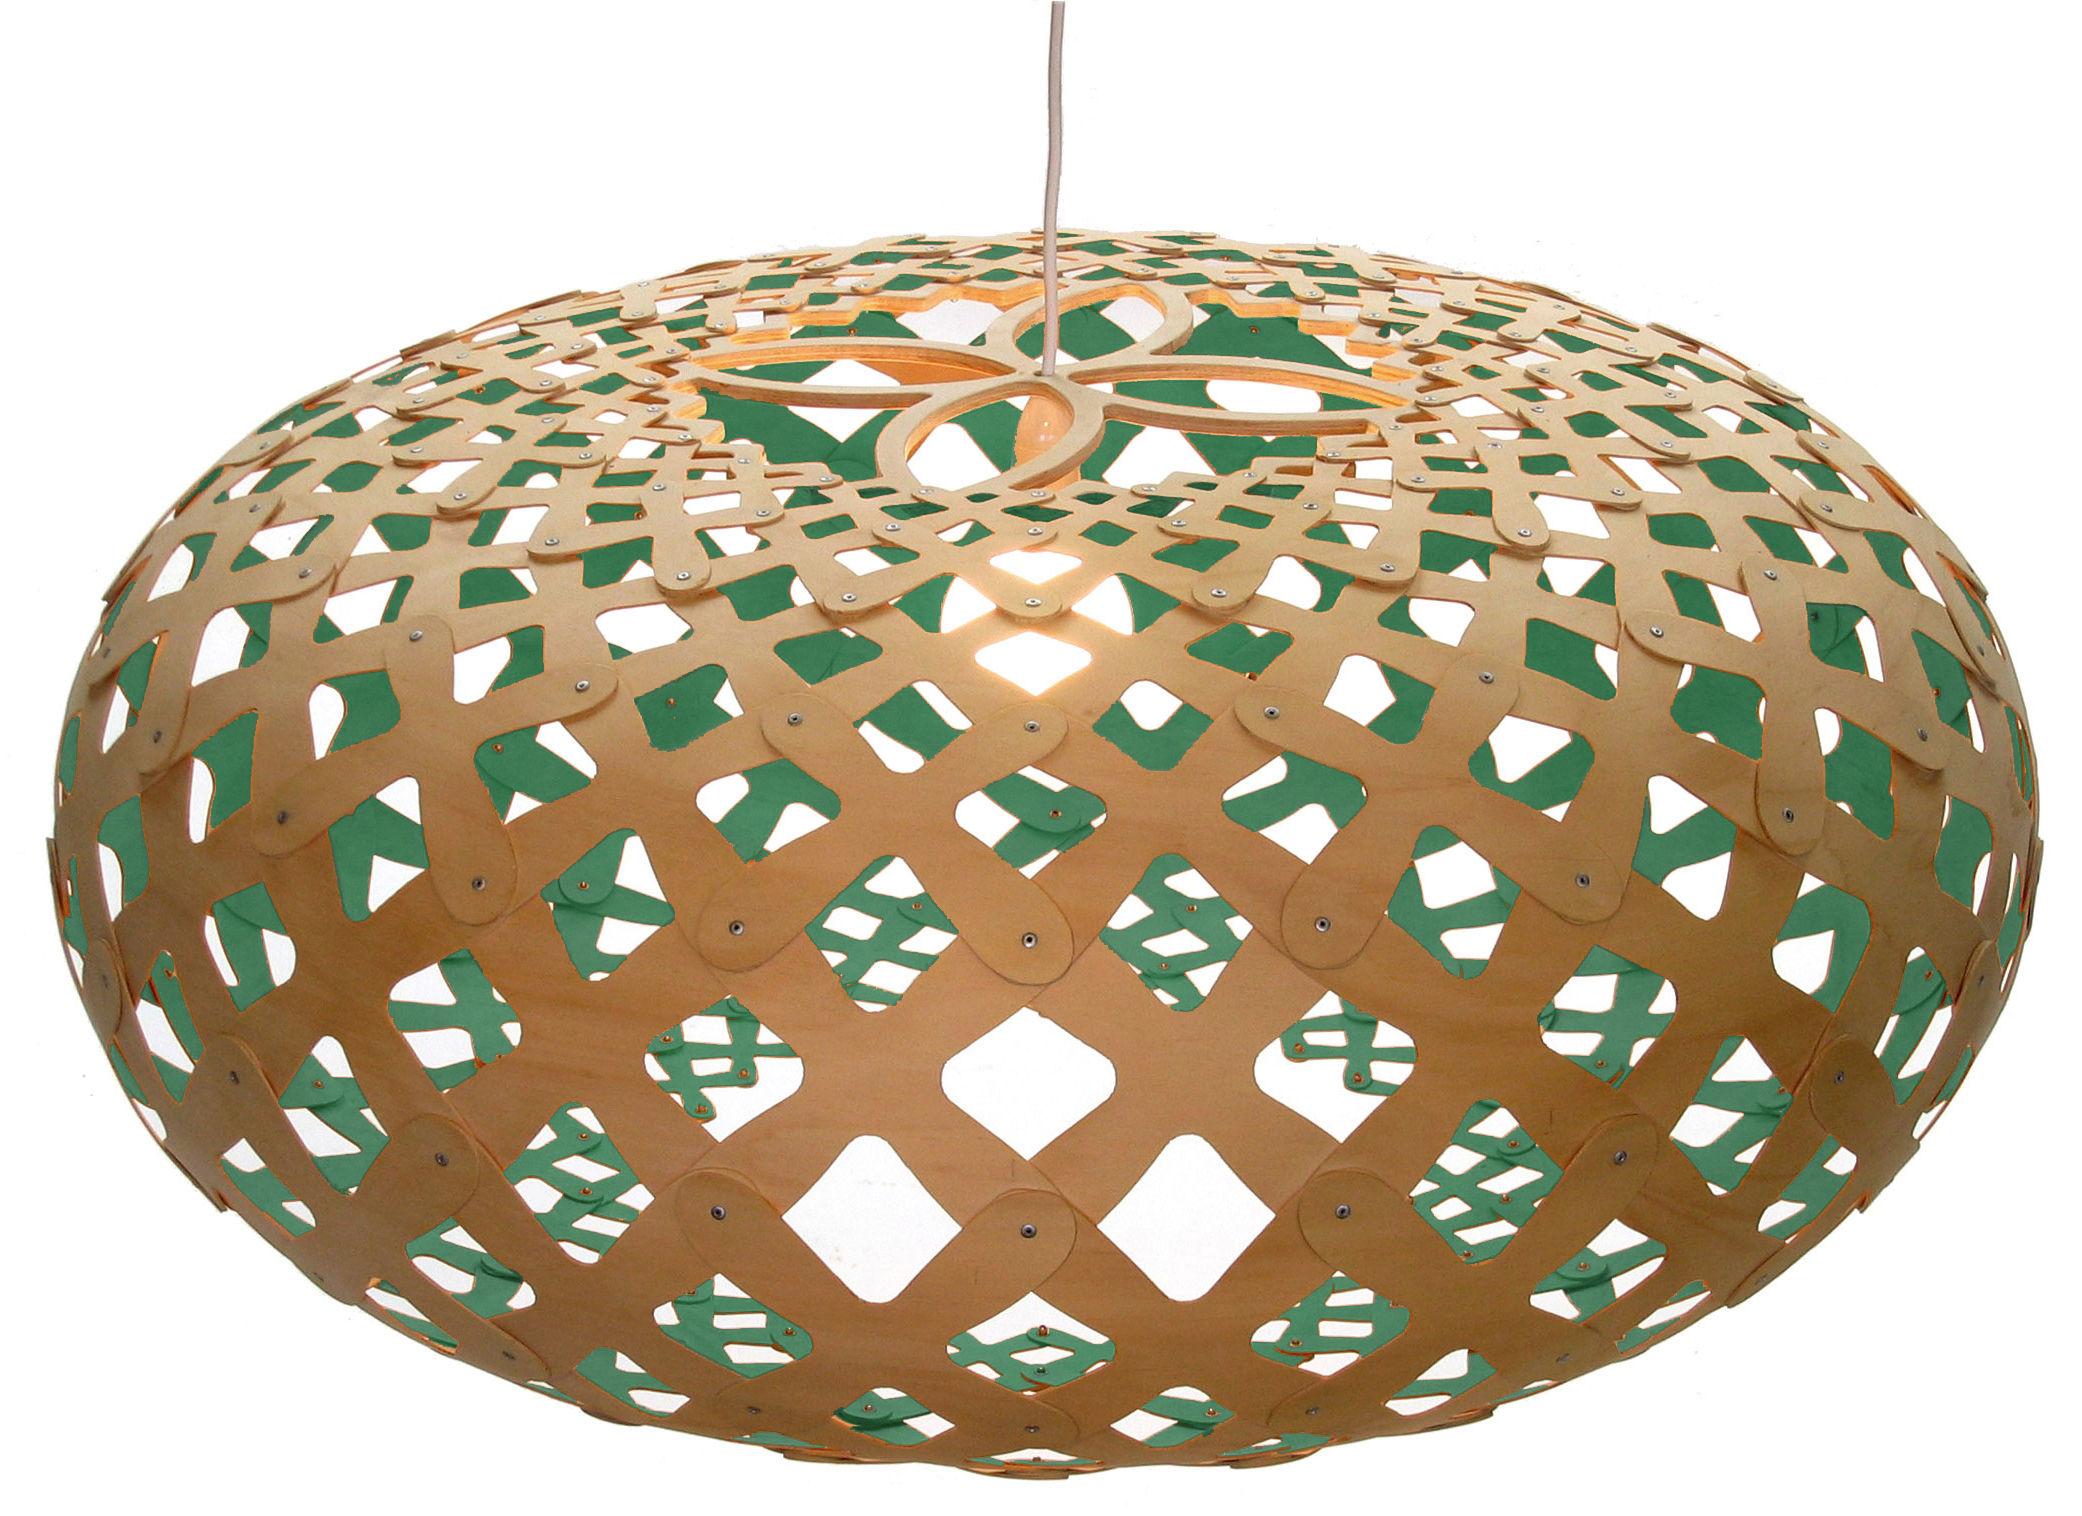 Lighting - Pendant Lighting - Kina Pendant - Ø 80 cm - Two-coloured by David Trubridge - Aqua blue/ natural wood - Pine